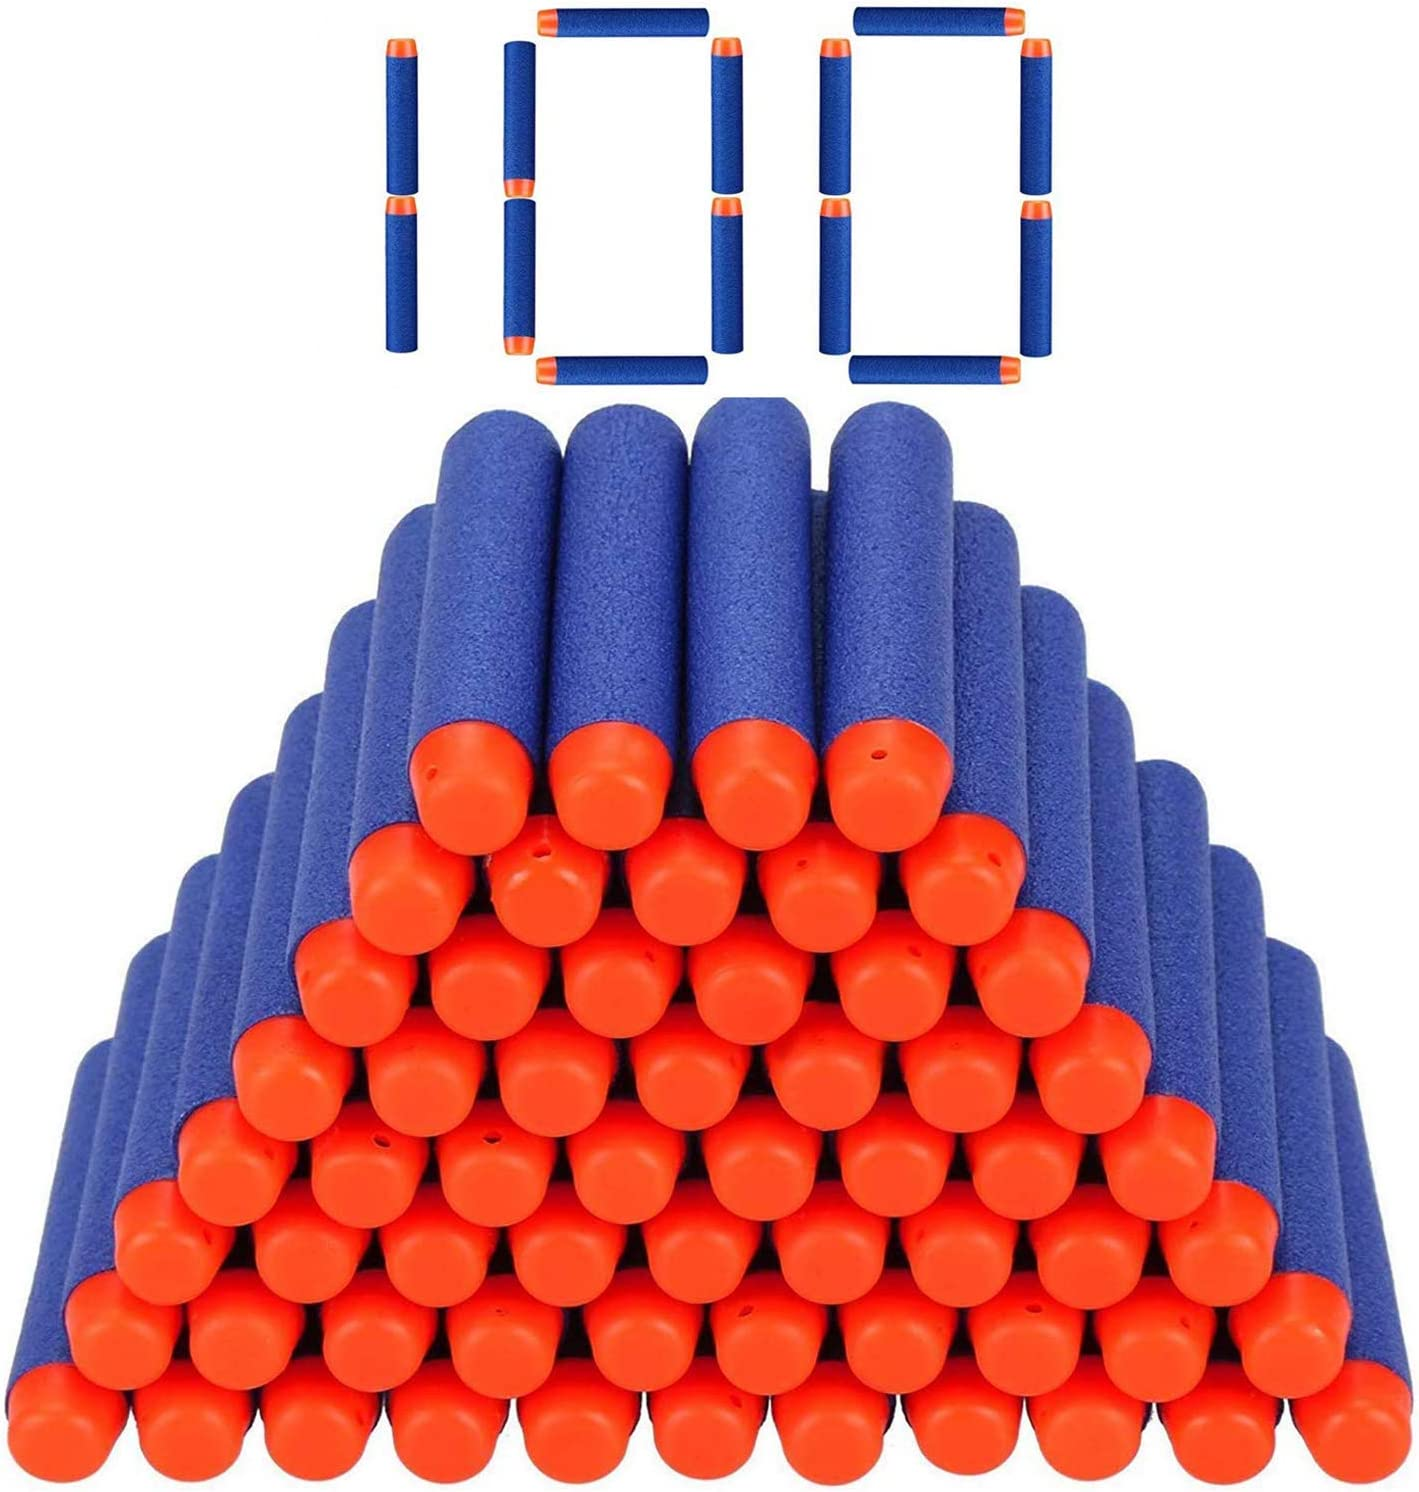 StillCool Nerf Dardos, 100 Pezas 7,2cm Espuma Suave Dardos Recarga Bala Blasters para Nerf N-Strike Elite Serie Niños Juguete Pistola Bullet Munición ( Azul Oscuro)